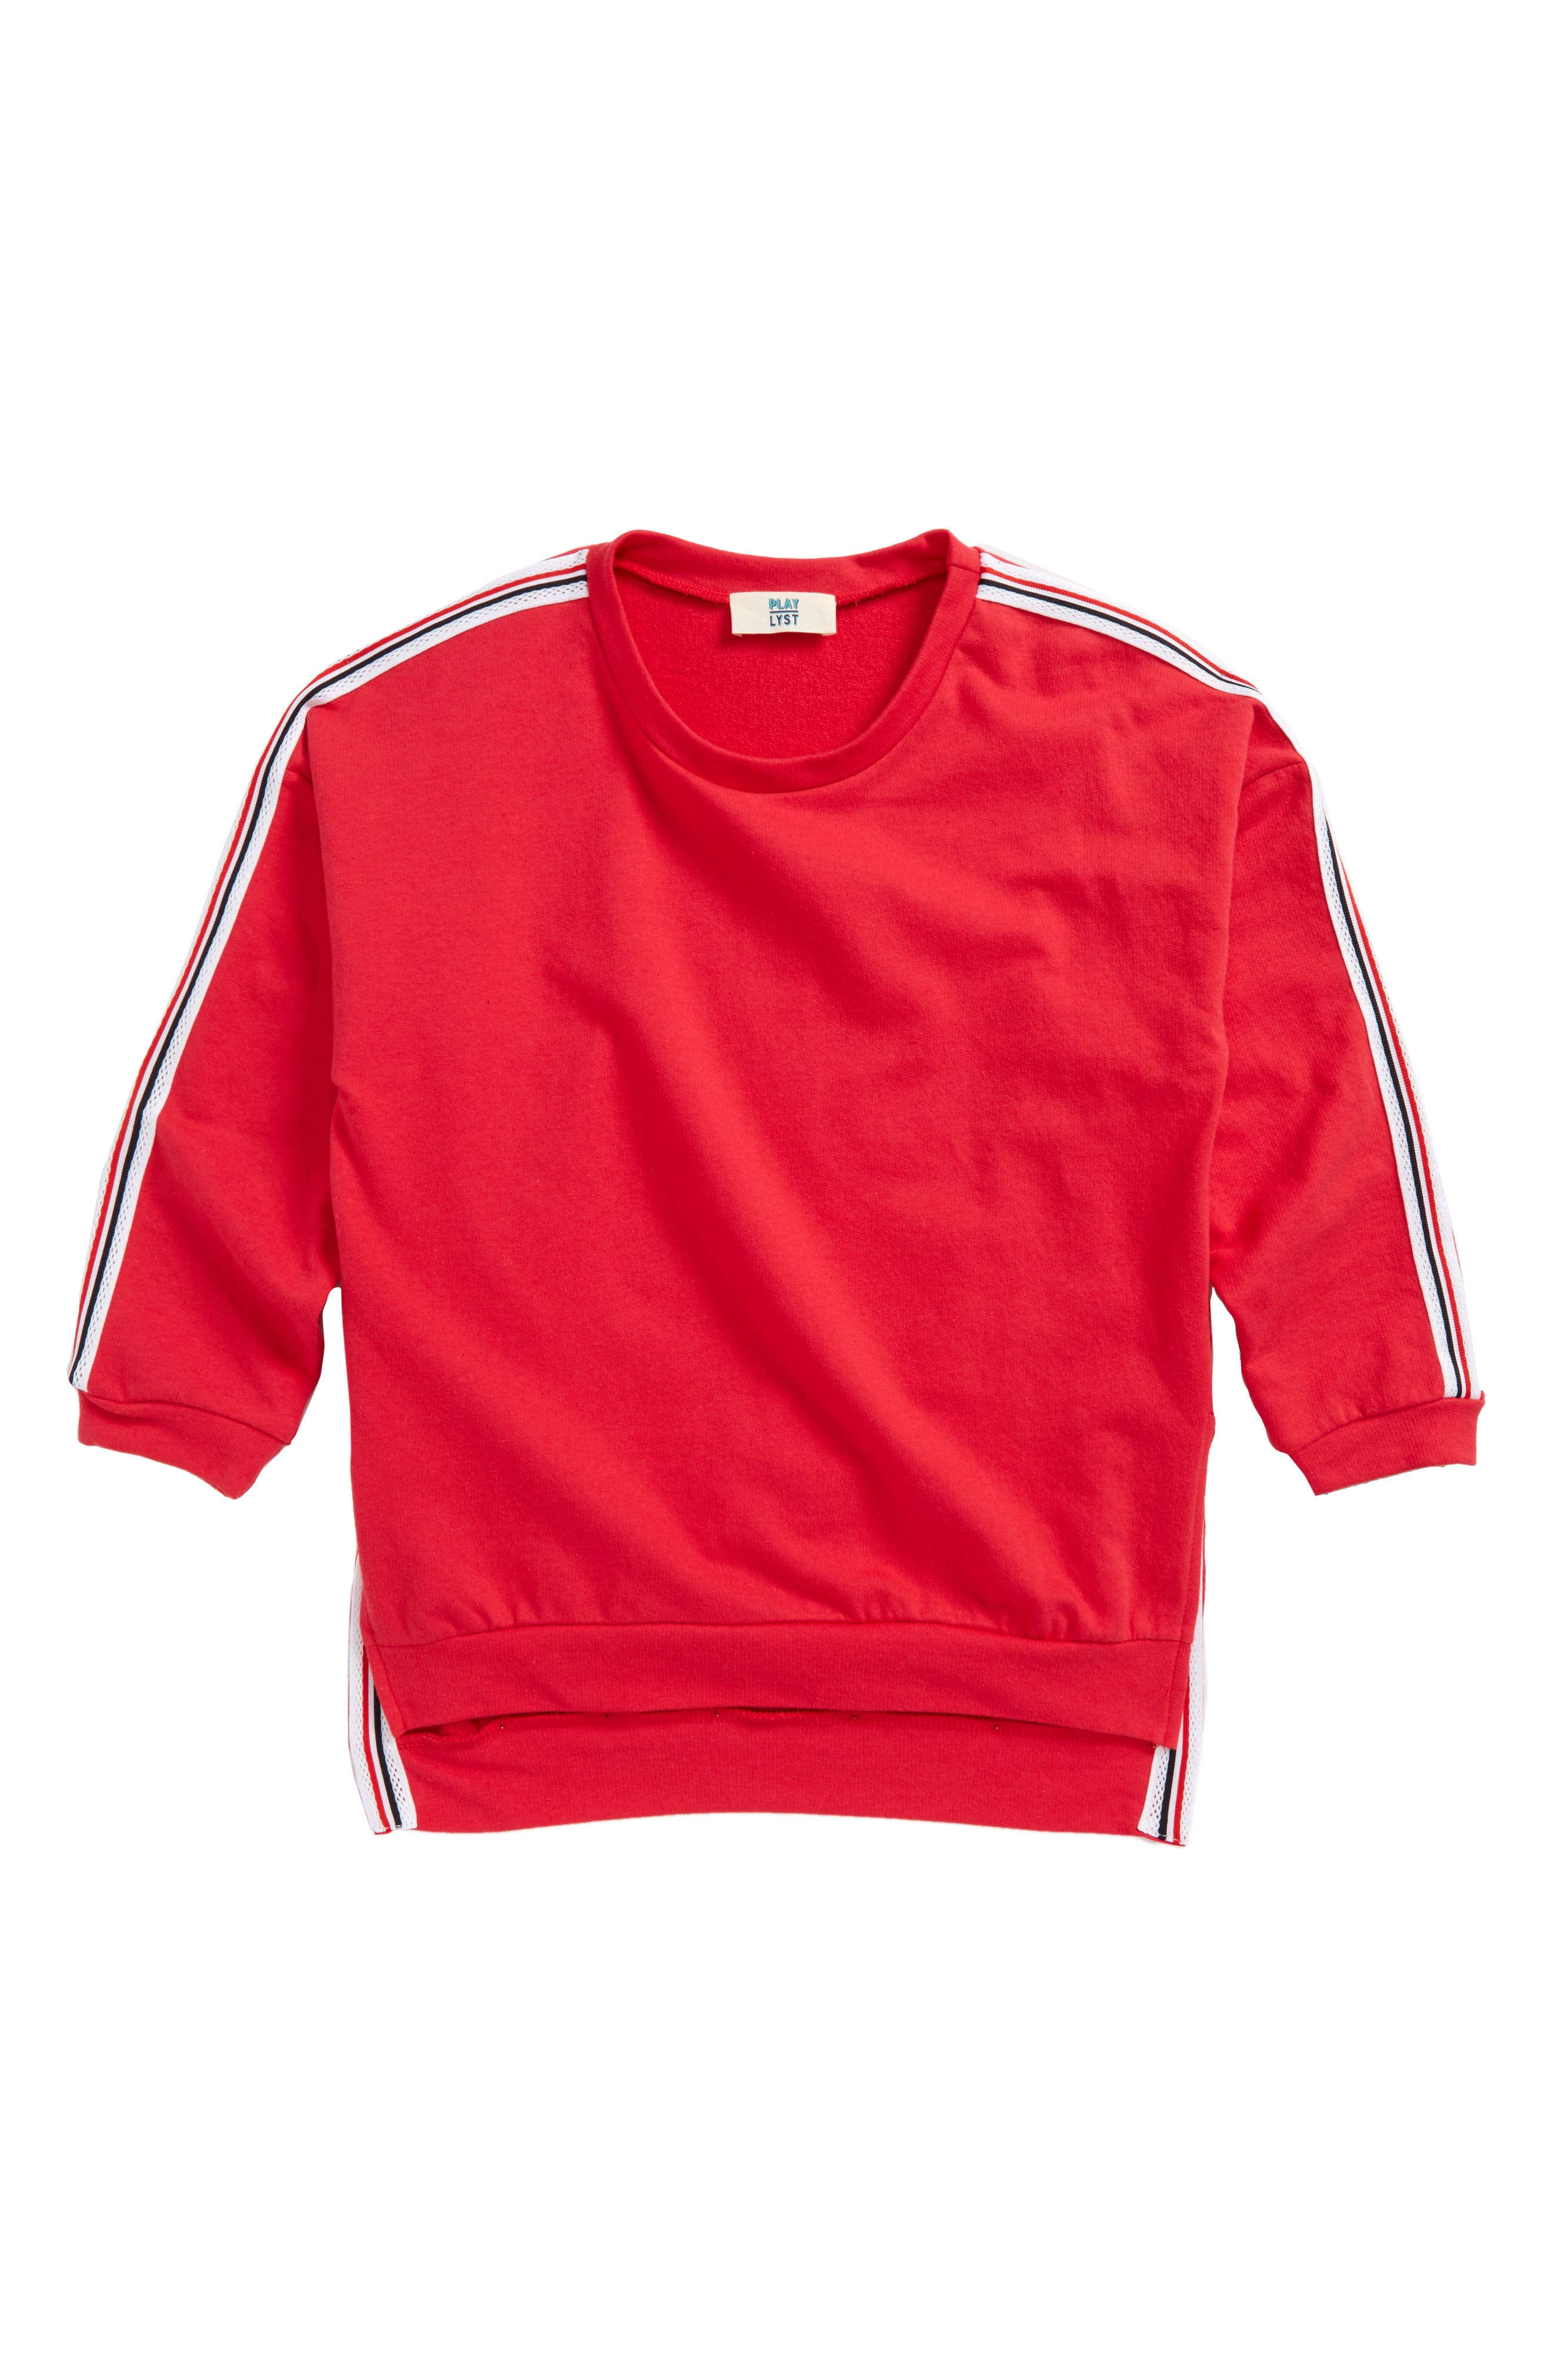 Stripe Trim Sweatshirt,                             Main thumbnail 1, color,                             Red